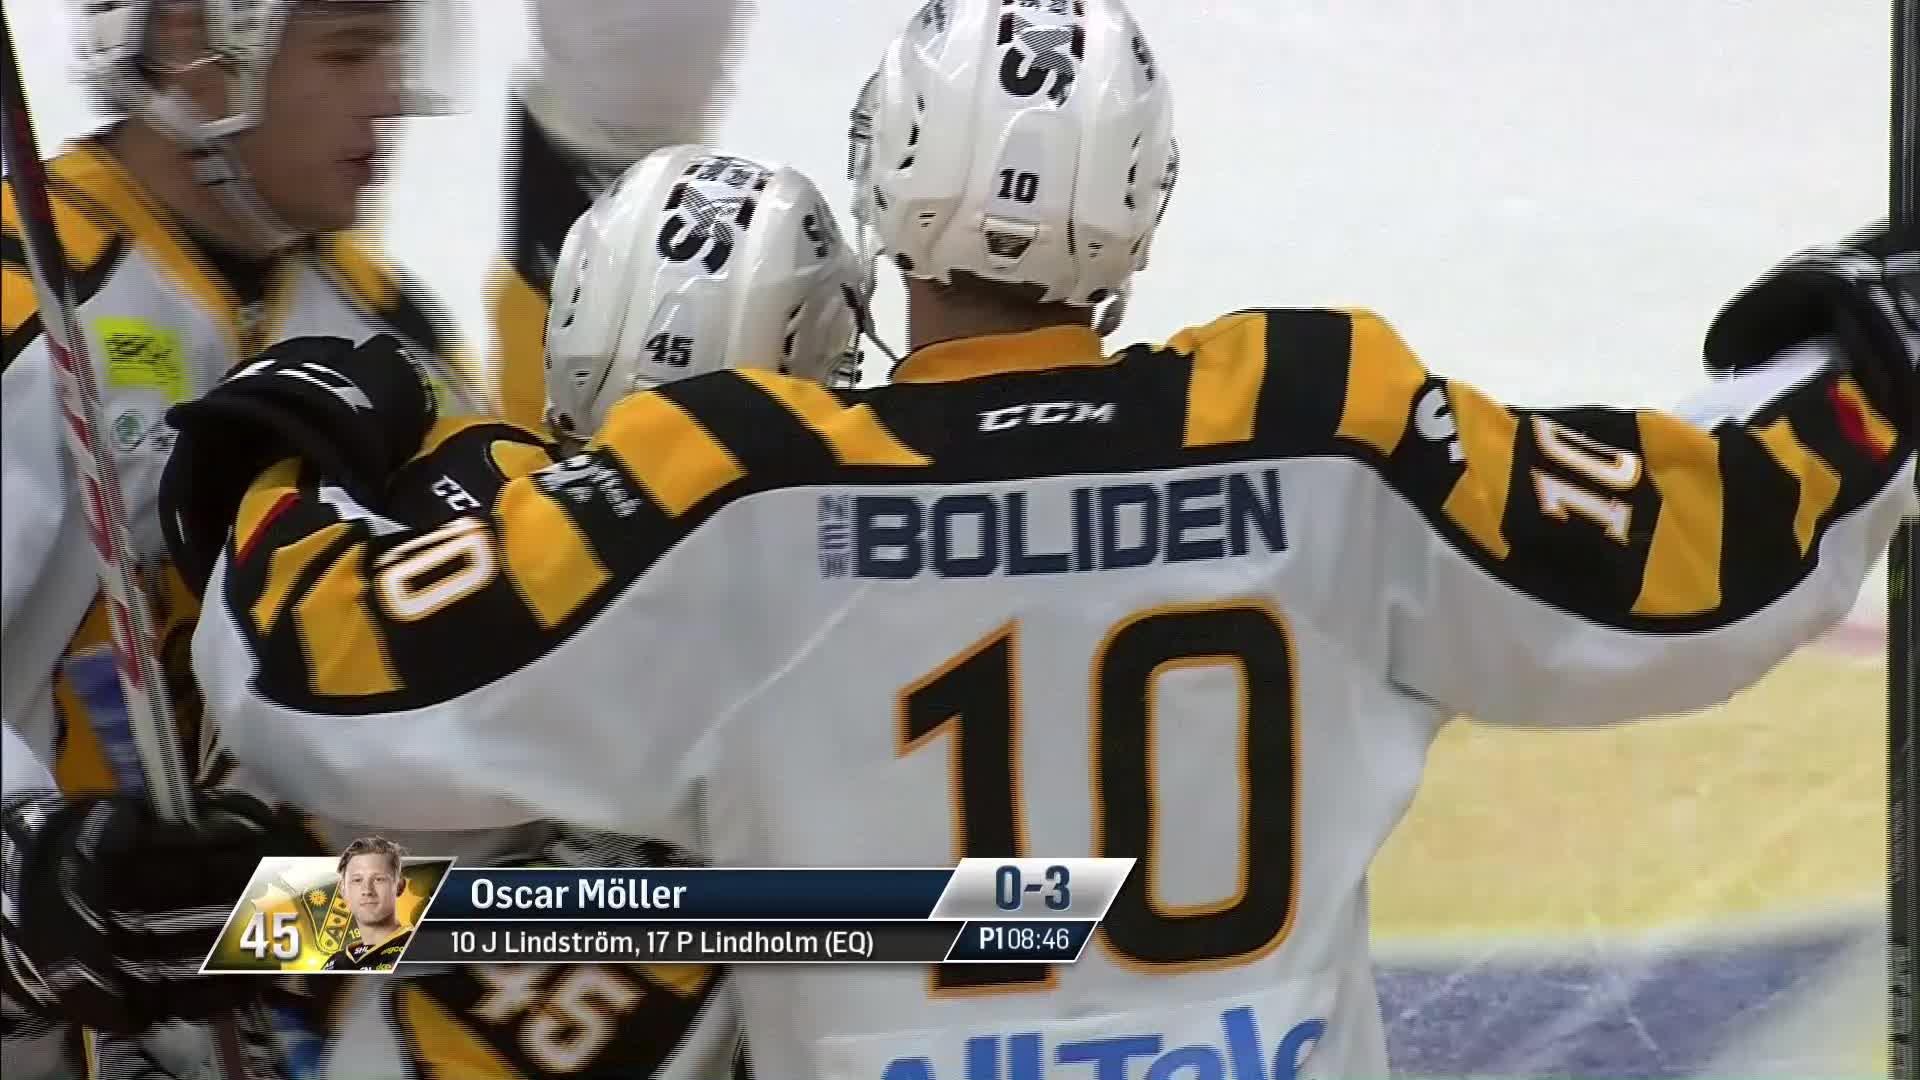 Rögle BK - Skellefteå AIK 0-3